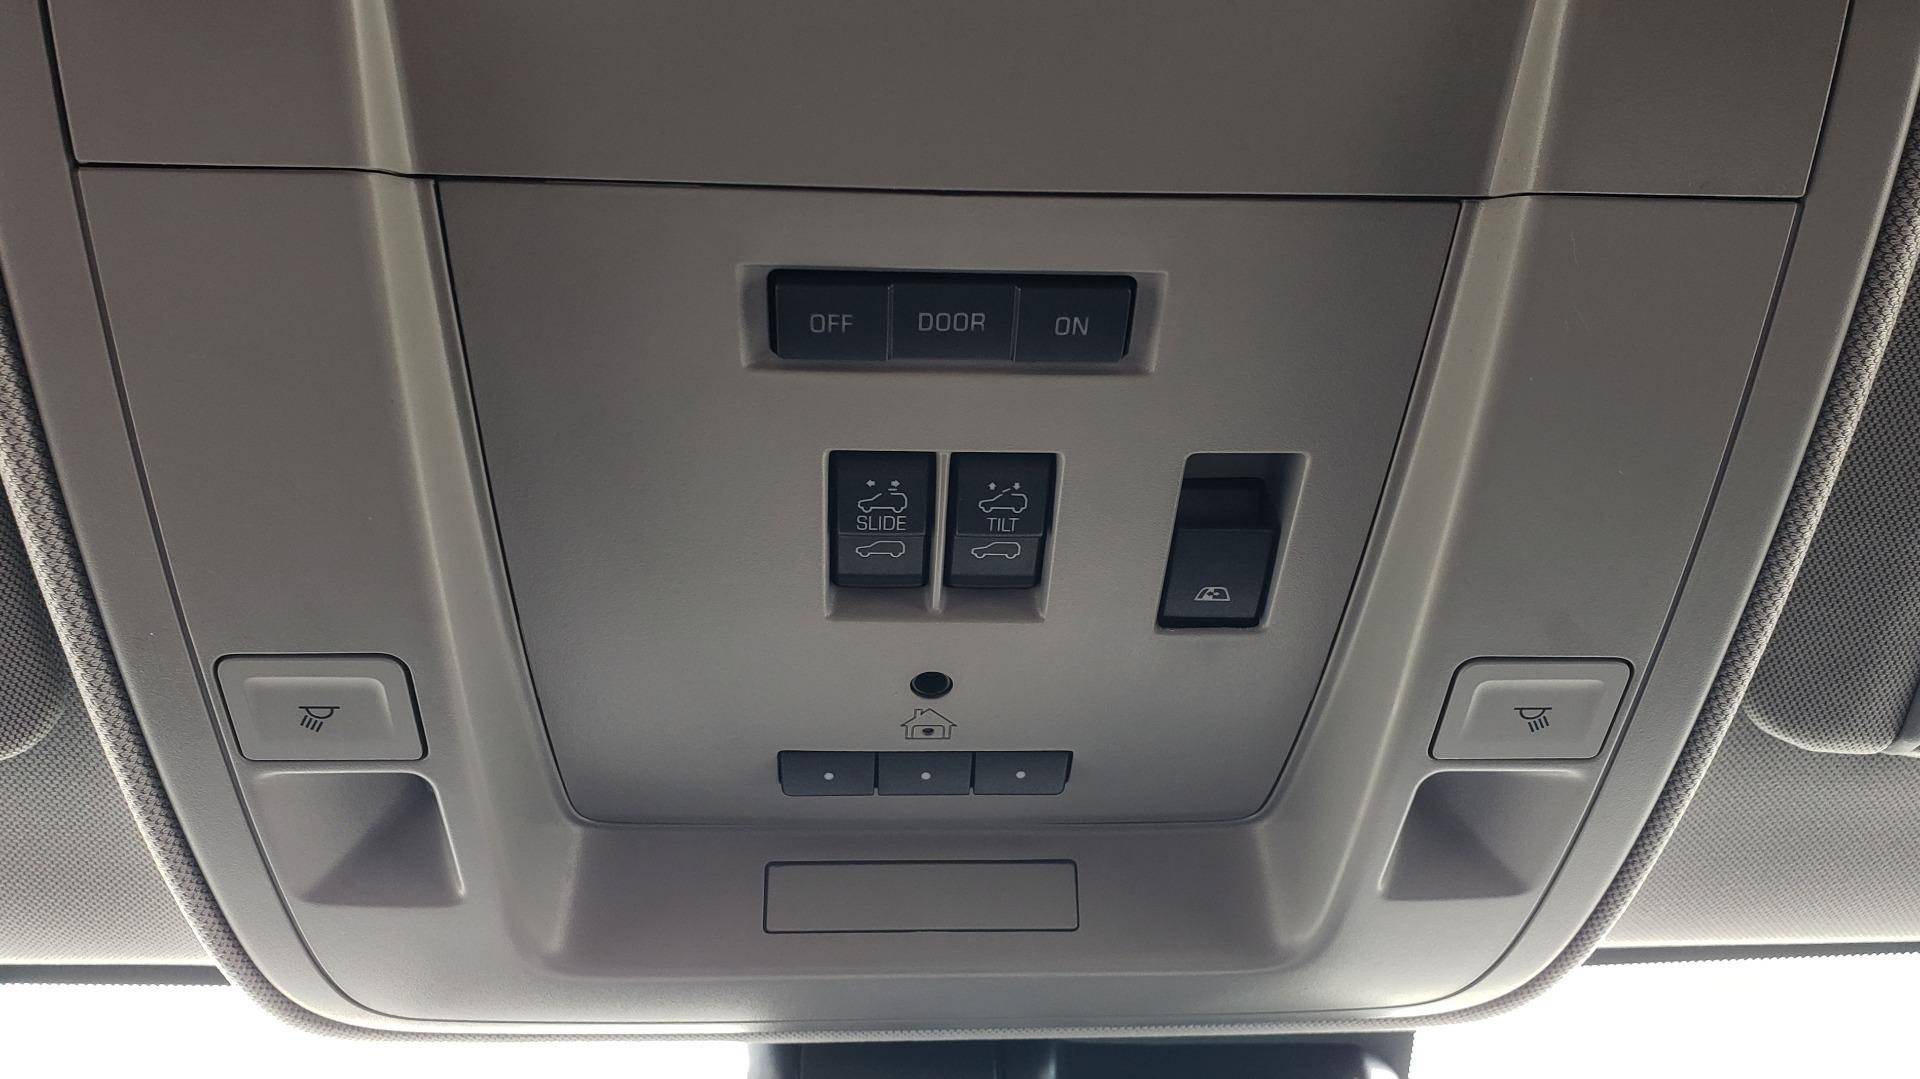 Used 2015 GMC SIERRA 2500HD DENALI / WIFI / NAV / DURAMAX PLUS / DRVR ALERT / SUNROOF / REARVIEW for sale $56,995 at Formula Imports in Charlotte NC 28227 49